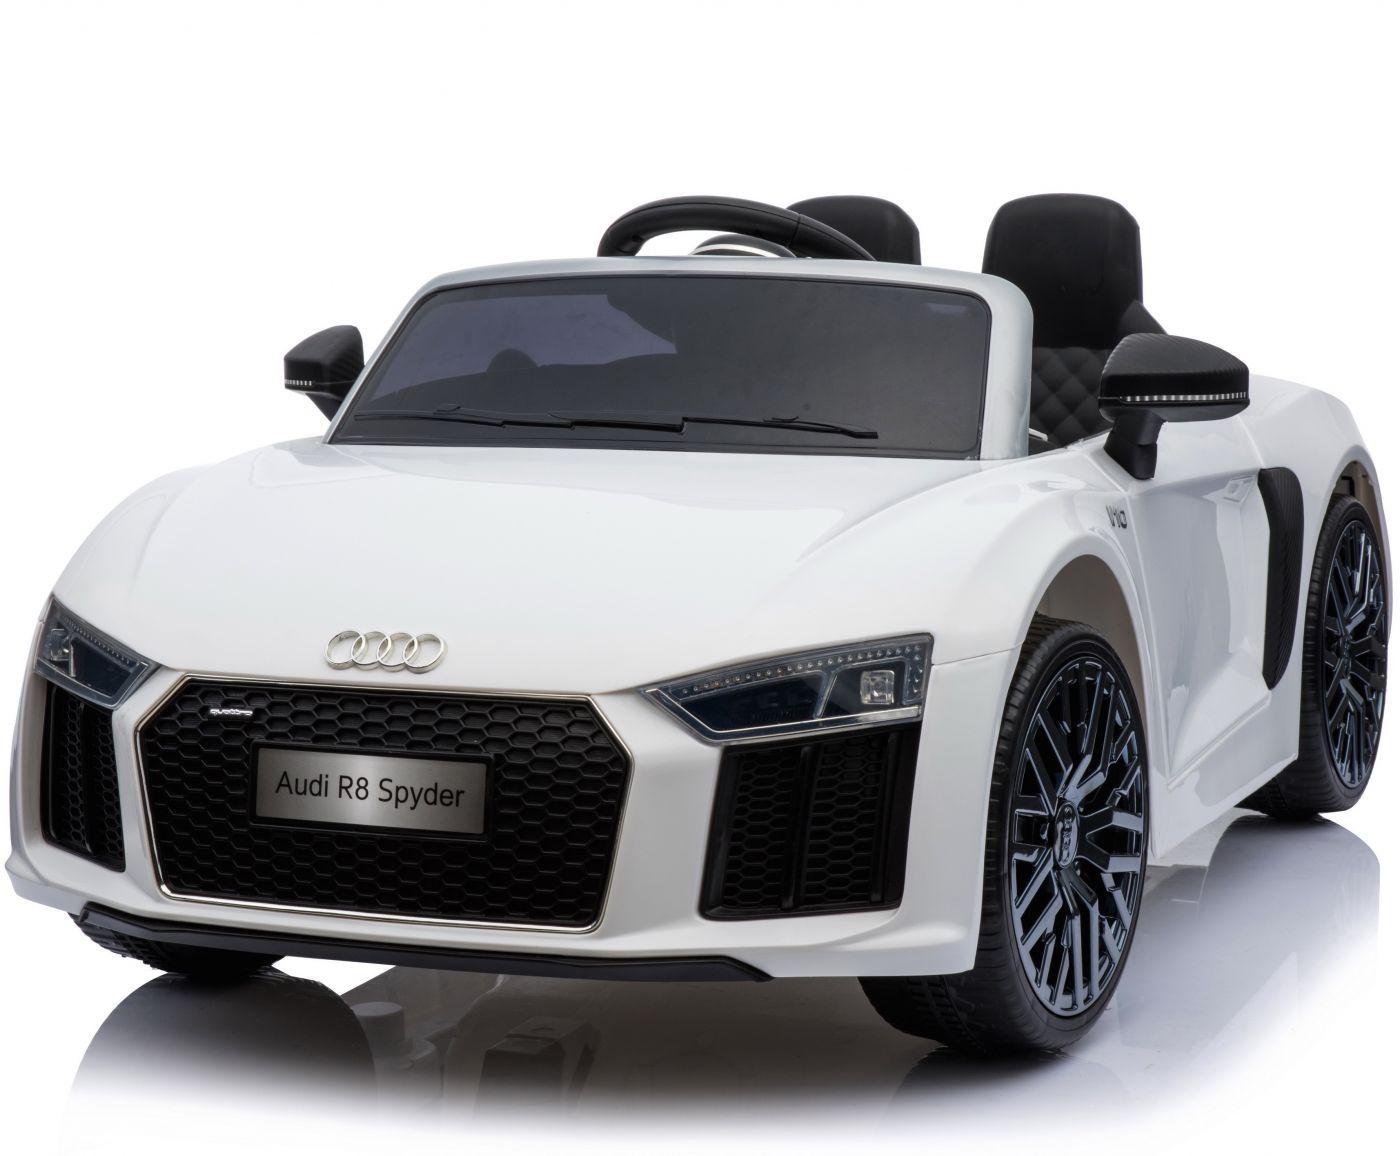 New Shape Licensed Audi R11 Spyder 11V Children's Electric Ride On Toy Car -  White | audi car toy